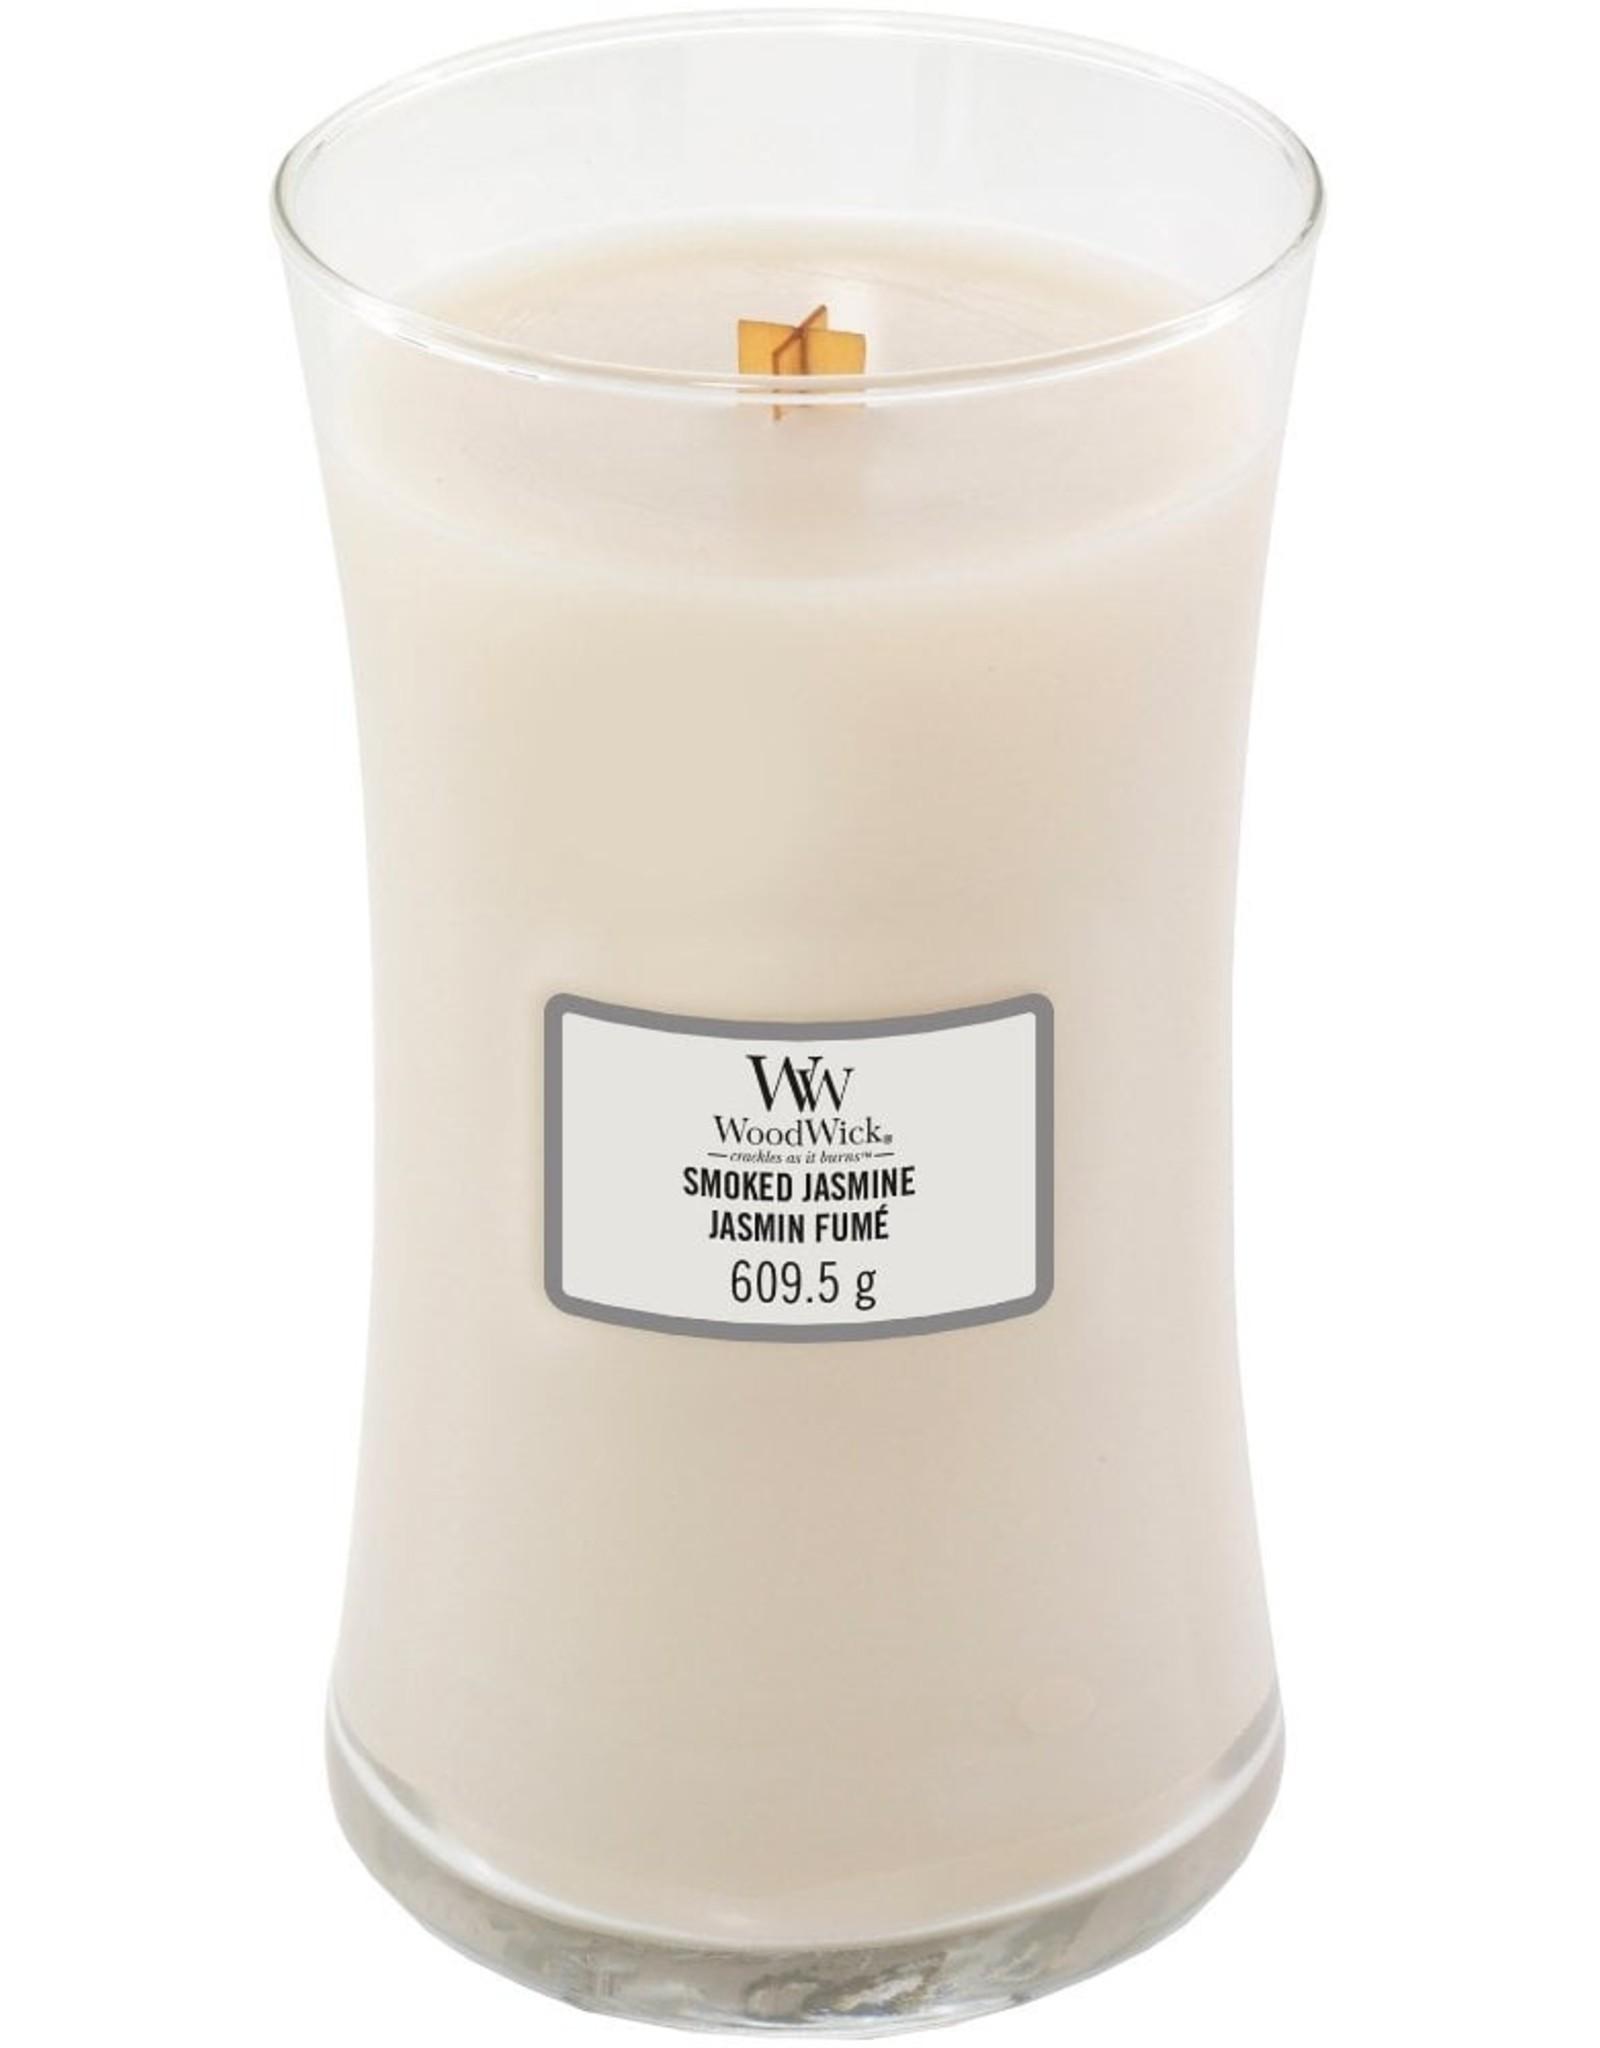 Woodwick Woodwick Smoked Jasmine Large Candle